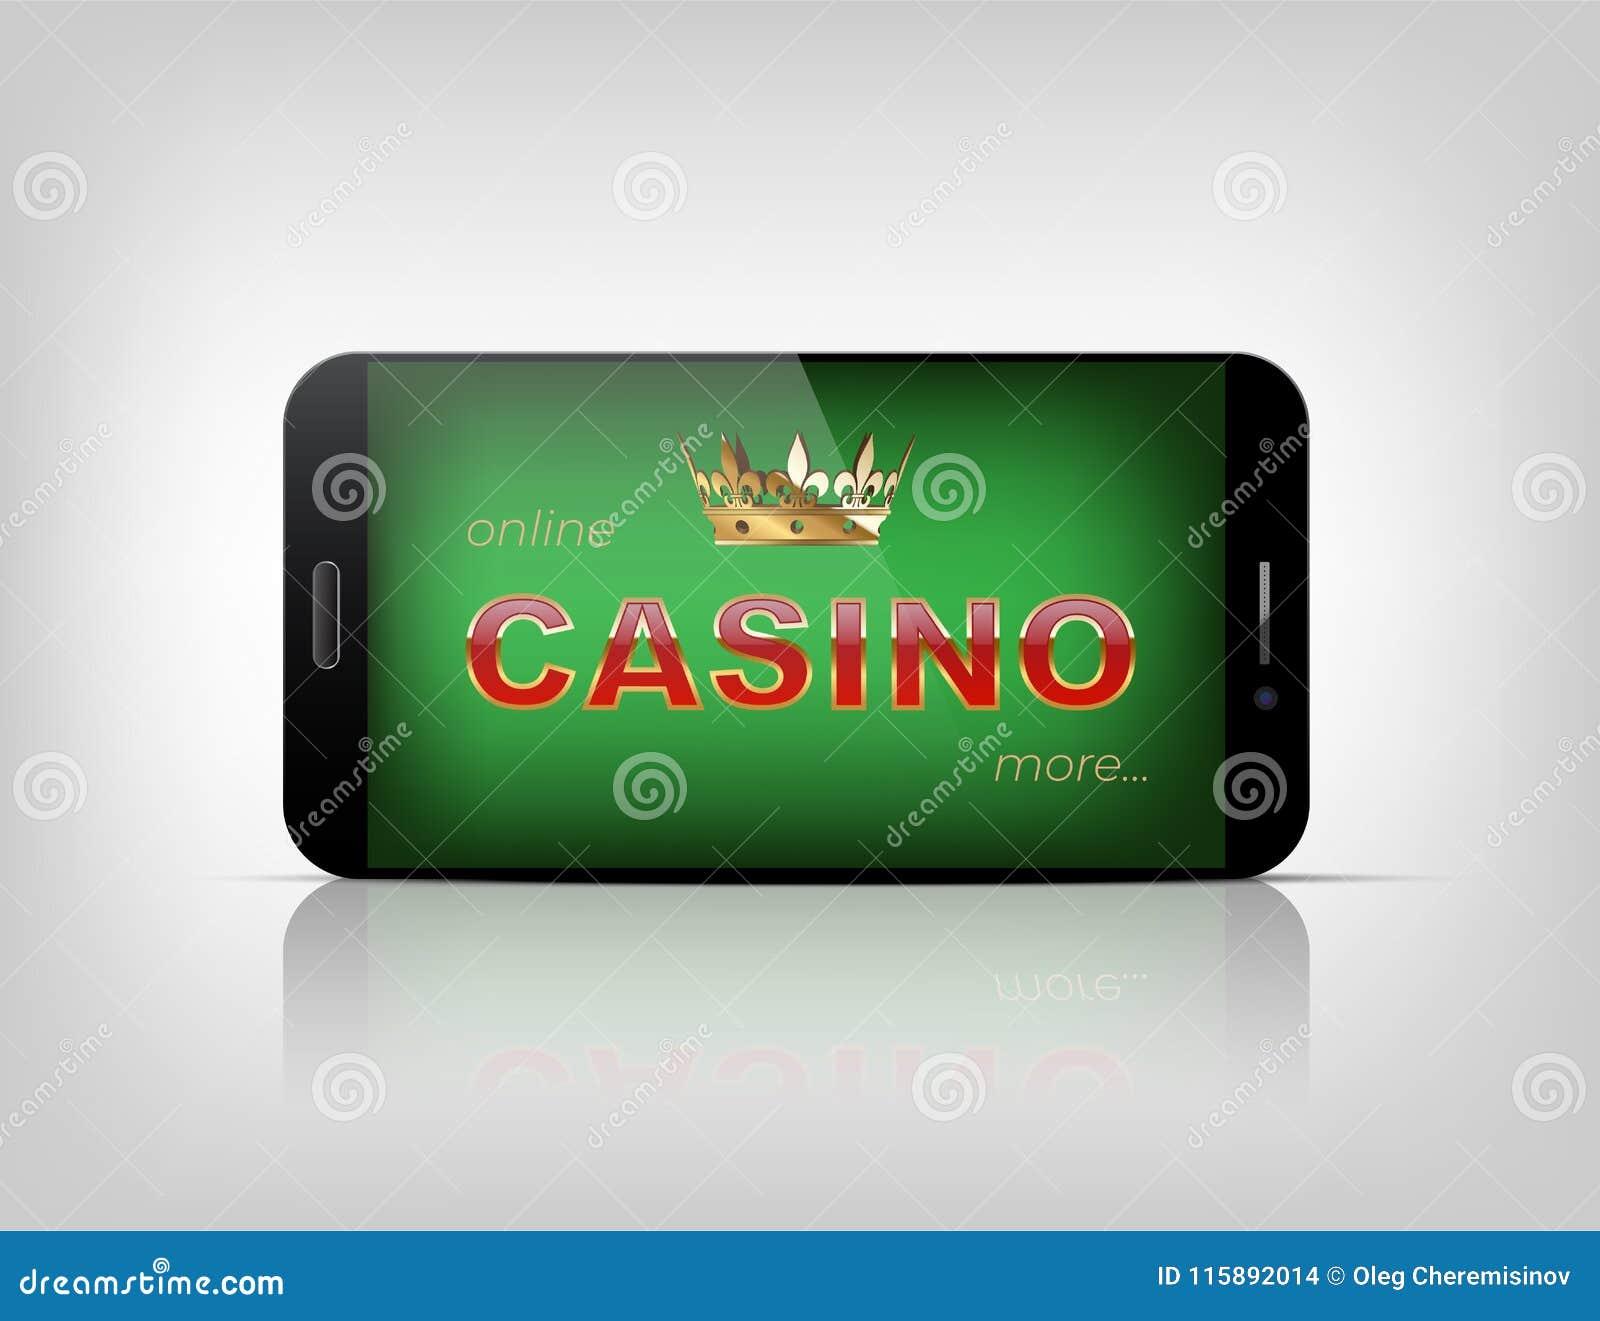 online casino design template online casino words on green